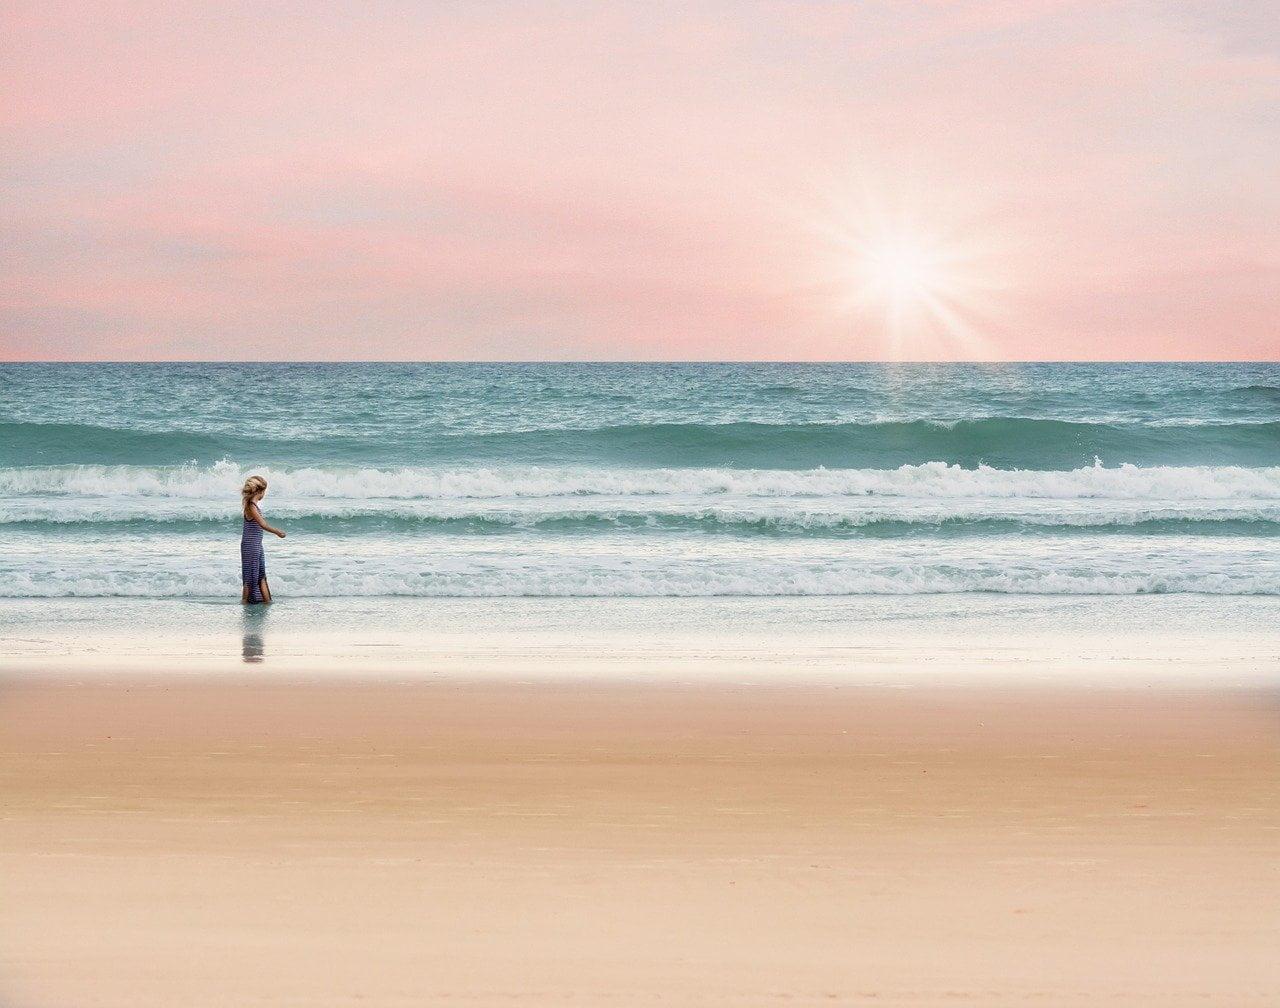 moving forward, kindness, courage, meditation